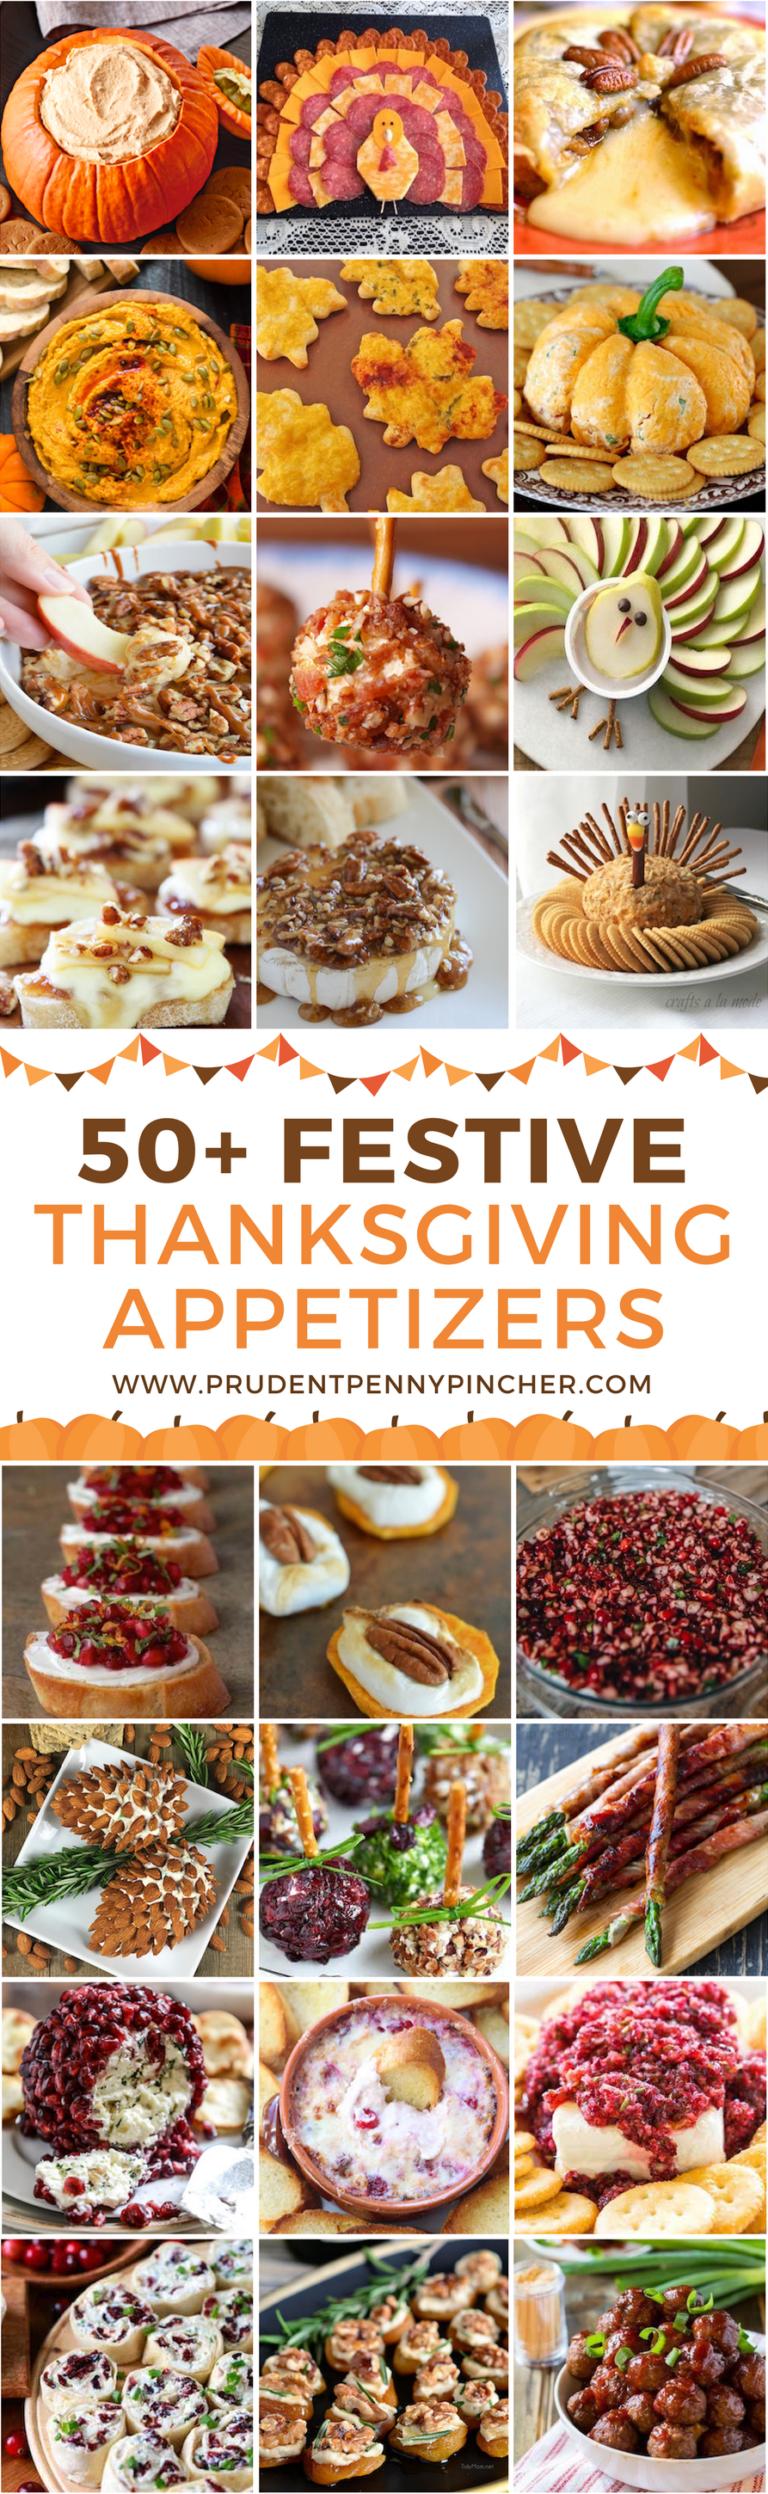 50 Festive Thanksgiving Appetizers